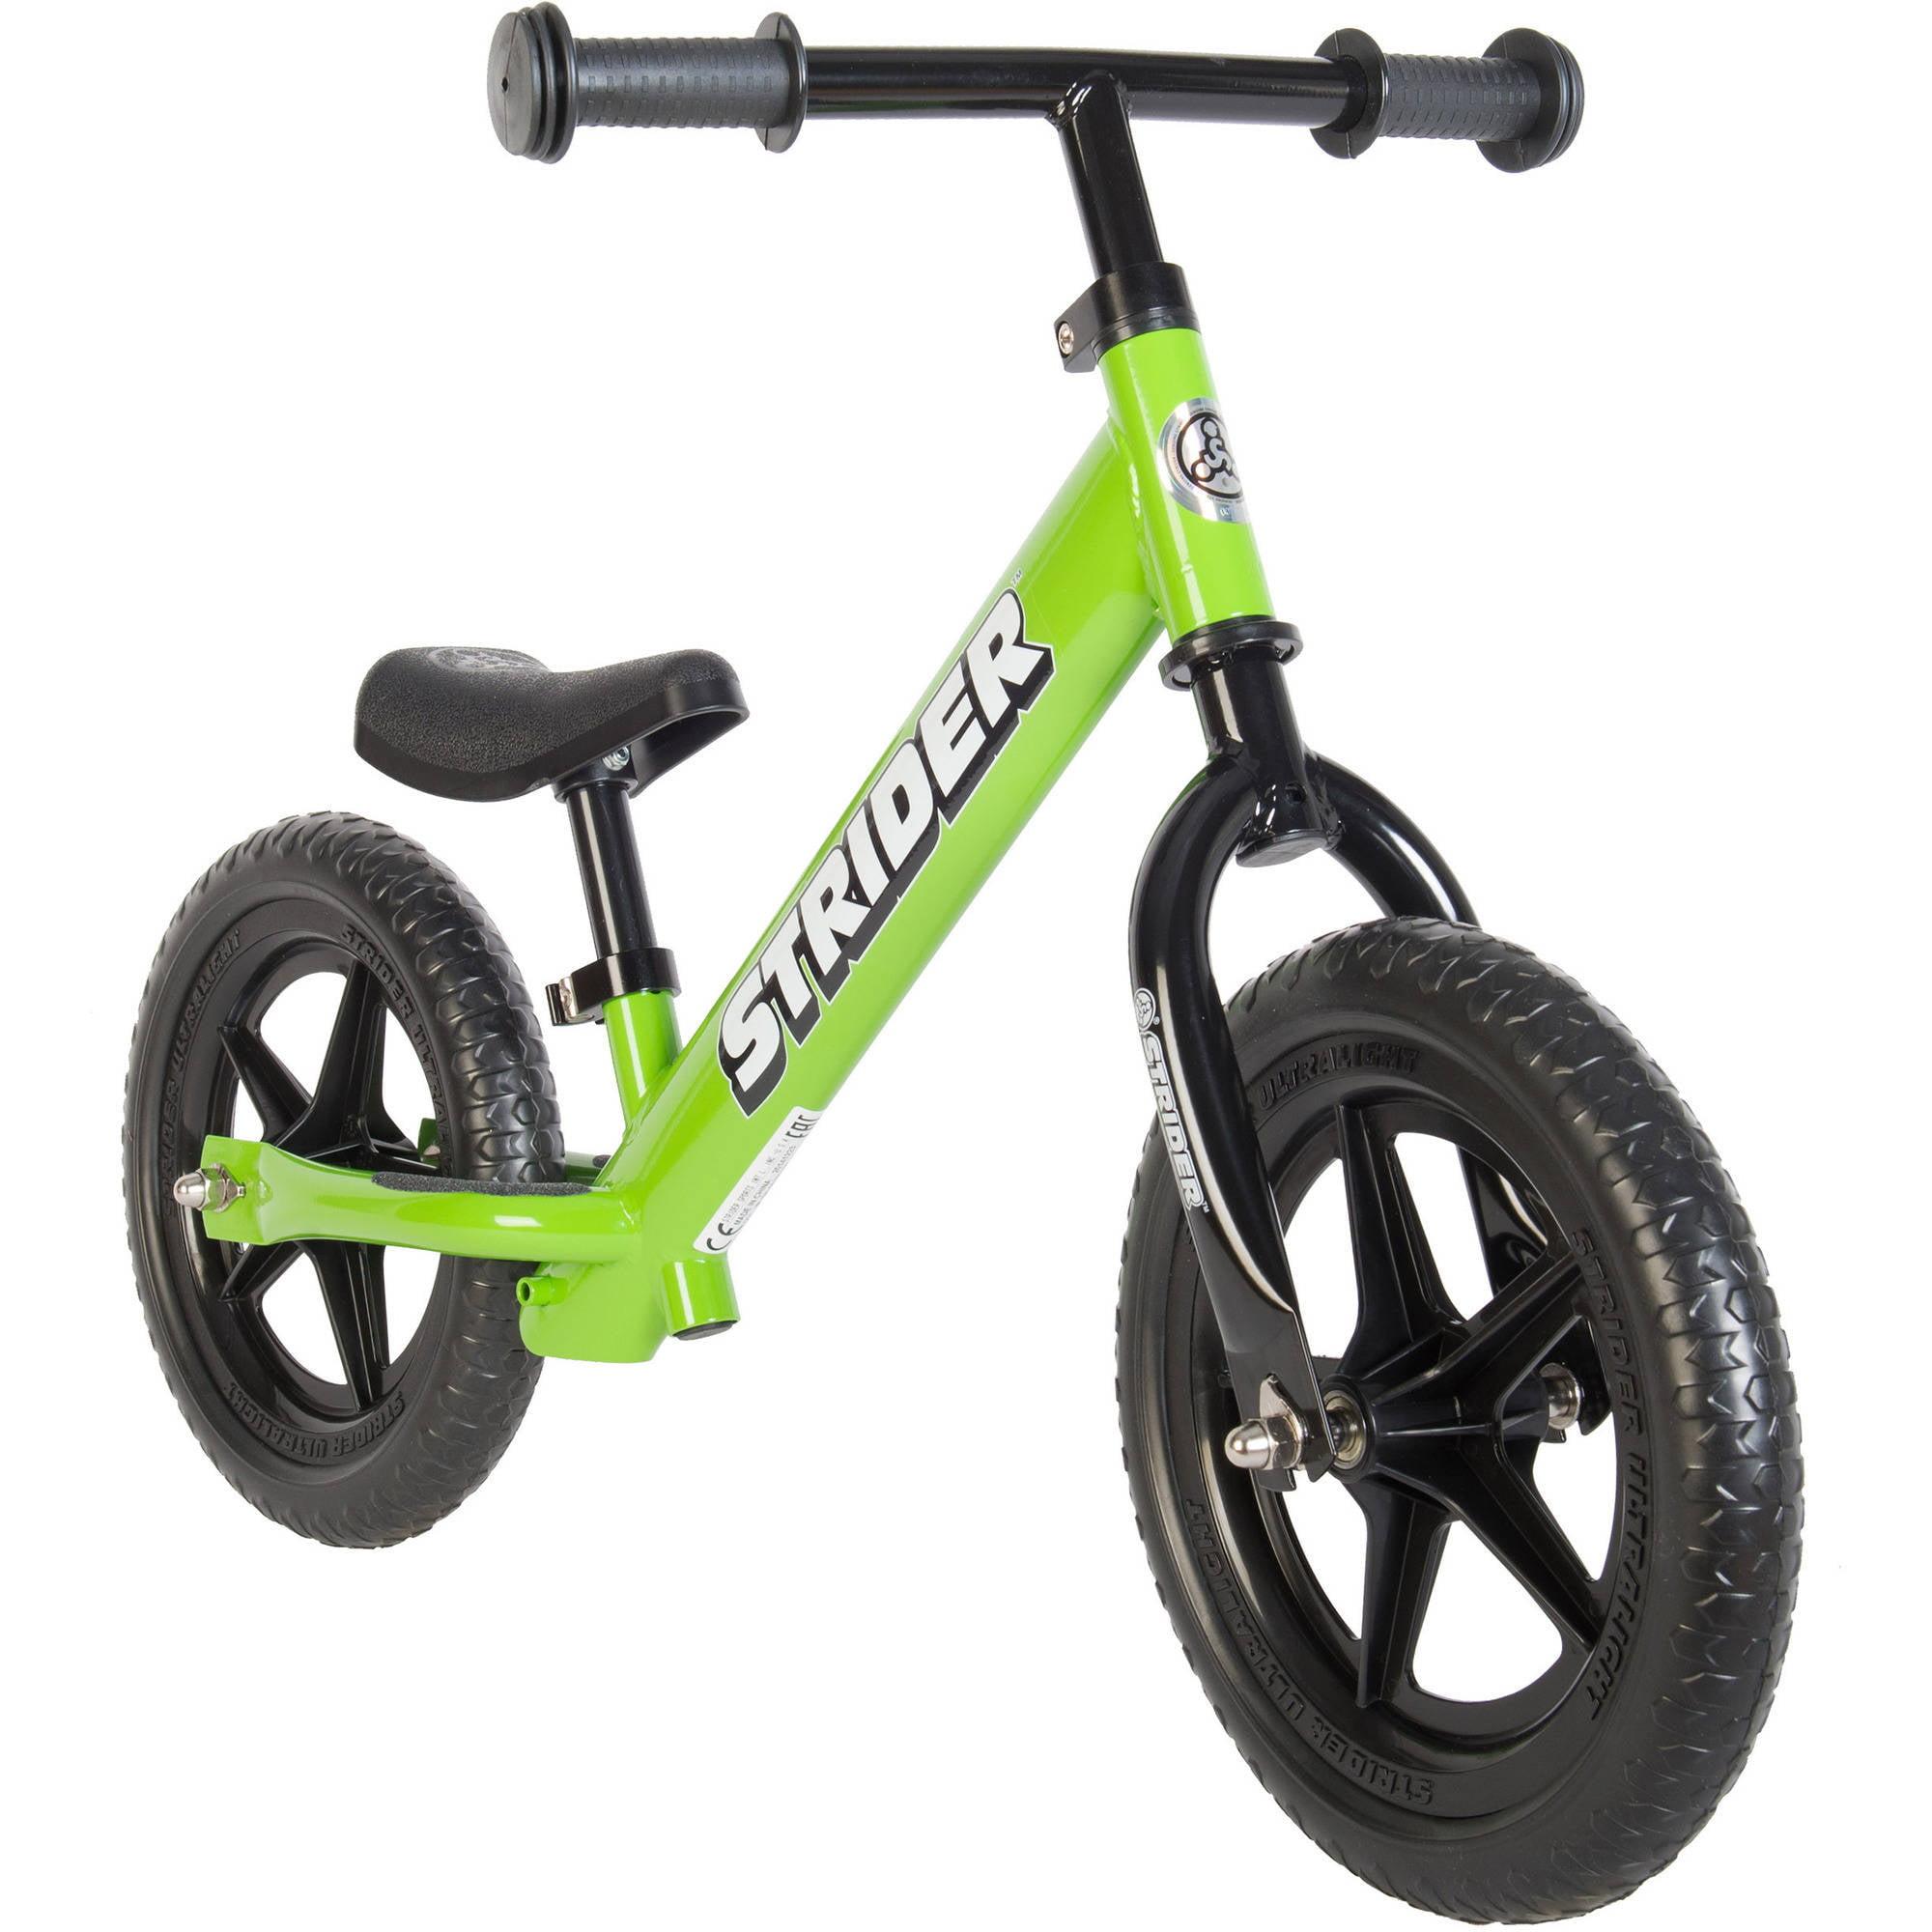 STRIDER 12 Classic Balance Bike, Green